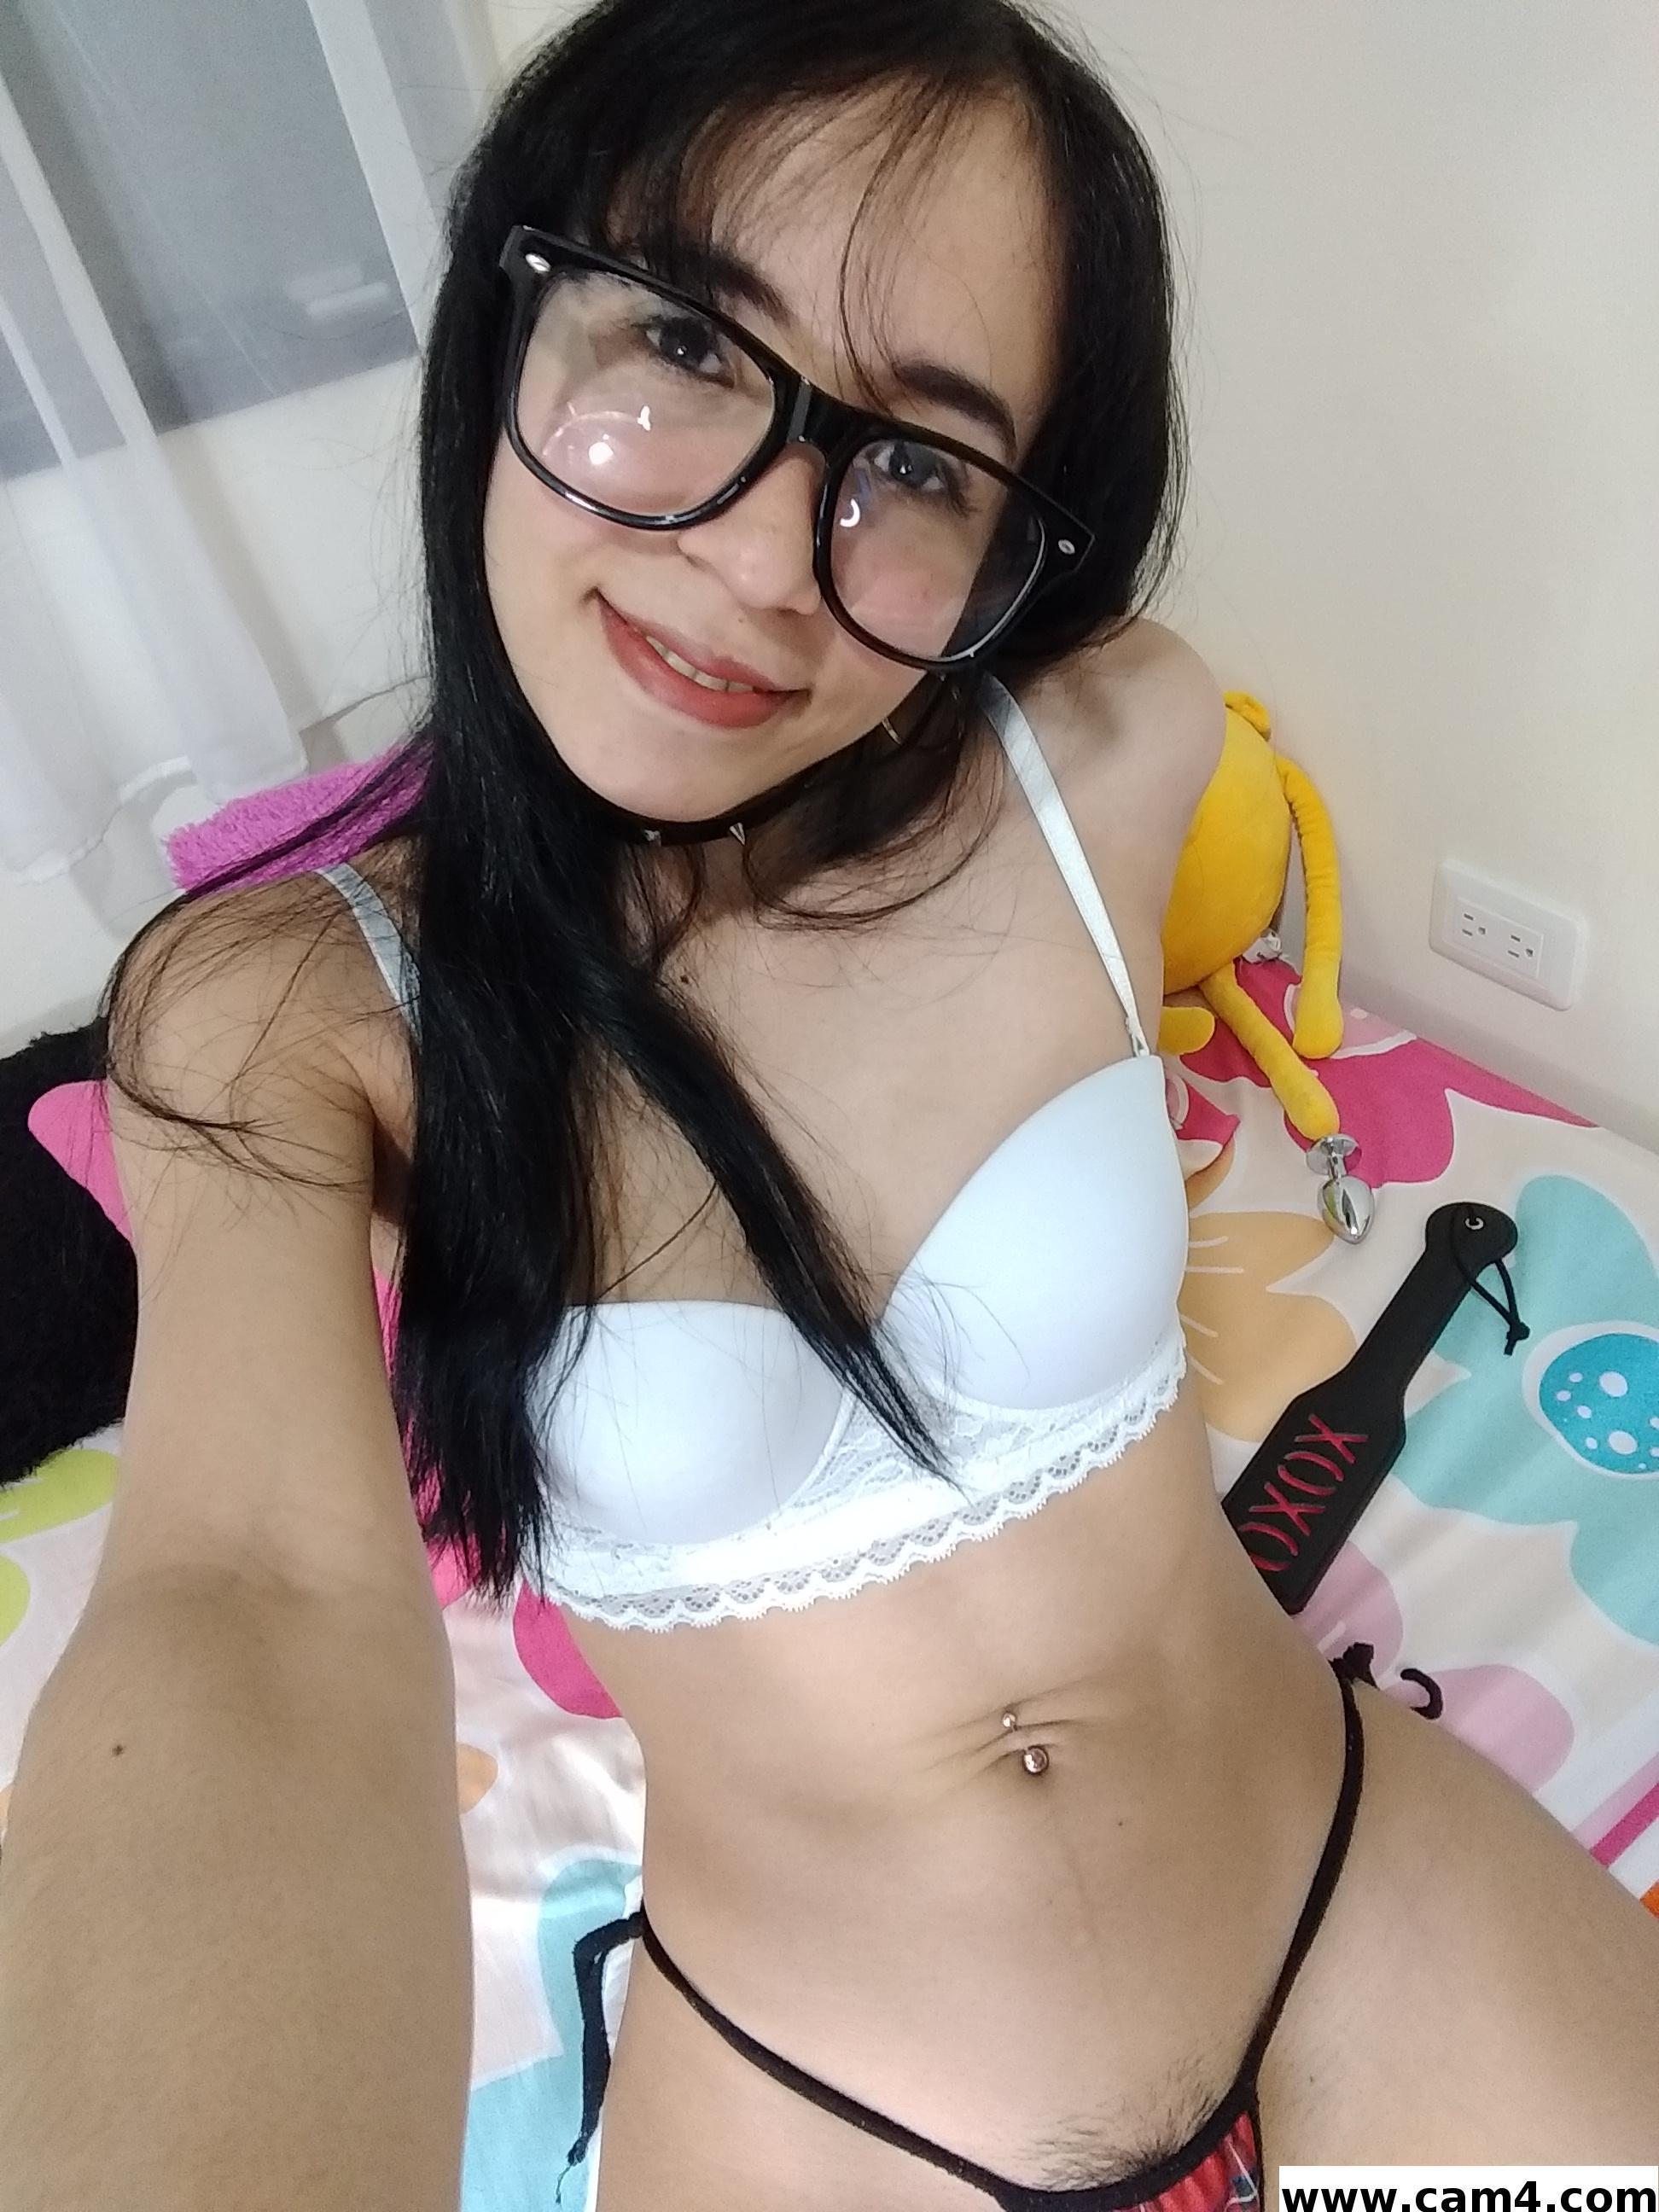 Chica kawaii?s=hyzmbu6mlipqsgddk0bxmjxxdtqlghu1e0iq3nf5ciq=